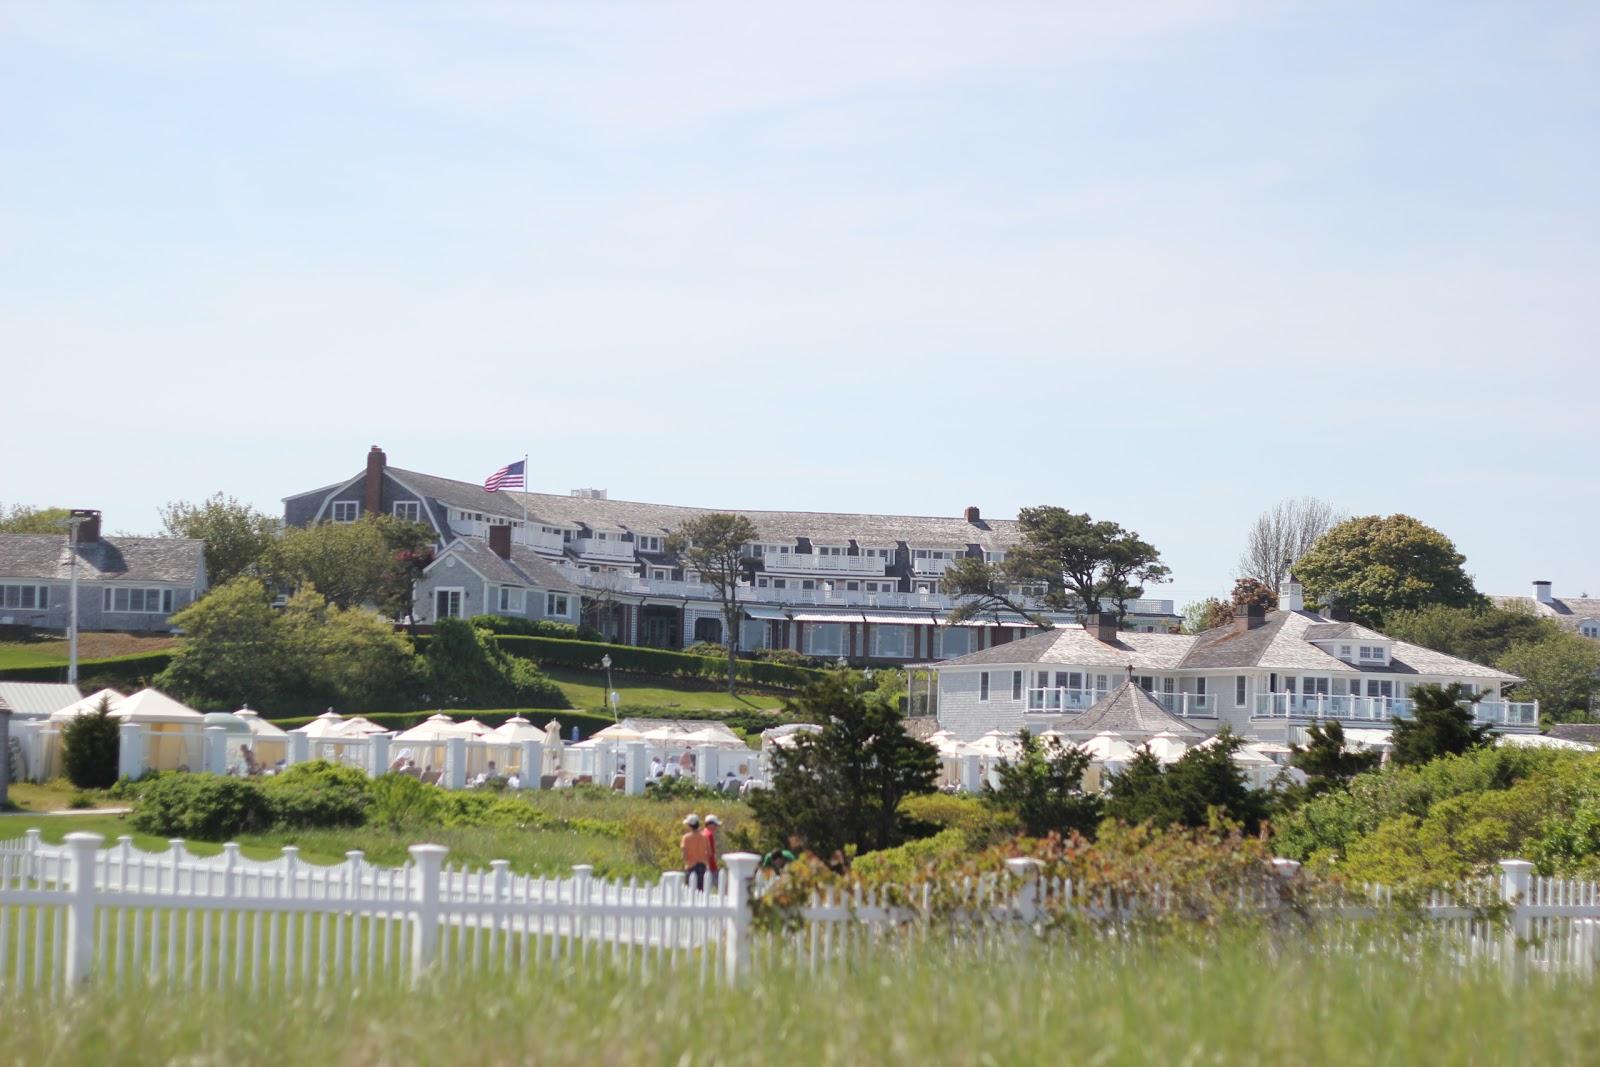 Jenny Steffens Hobick Cape Cod Weekend  A Classic New